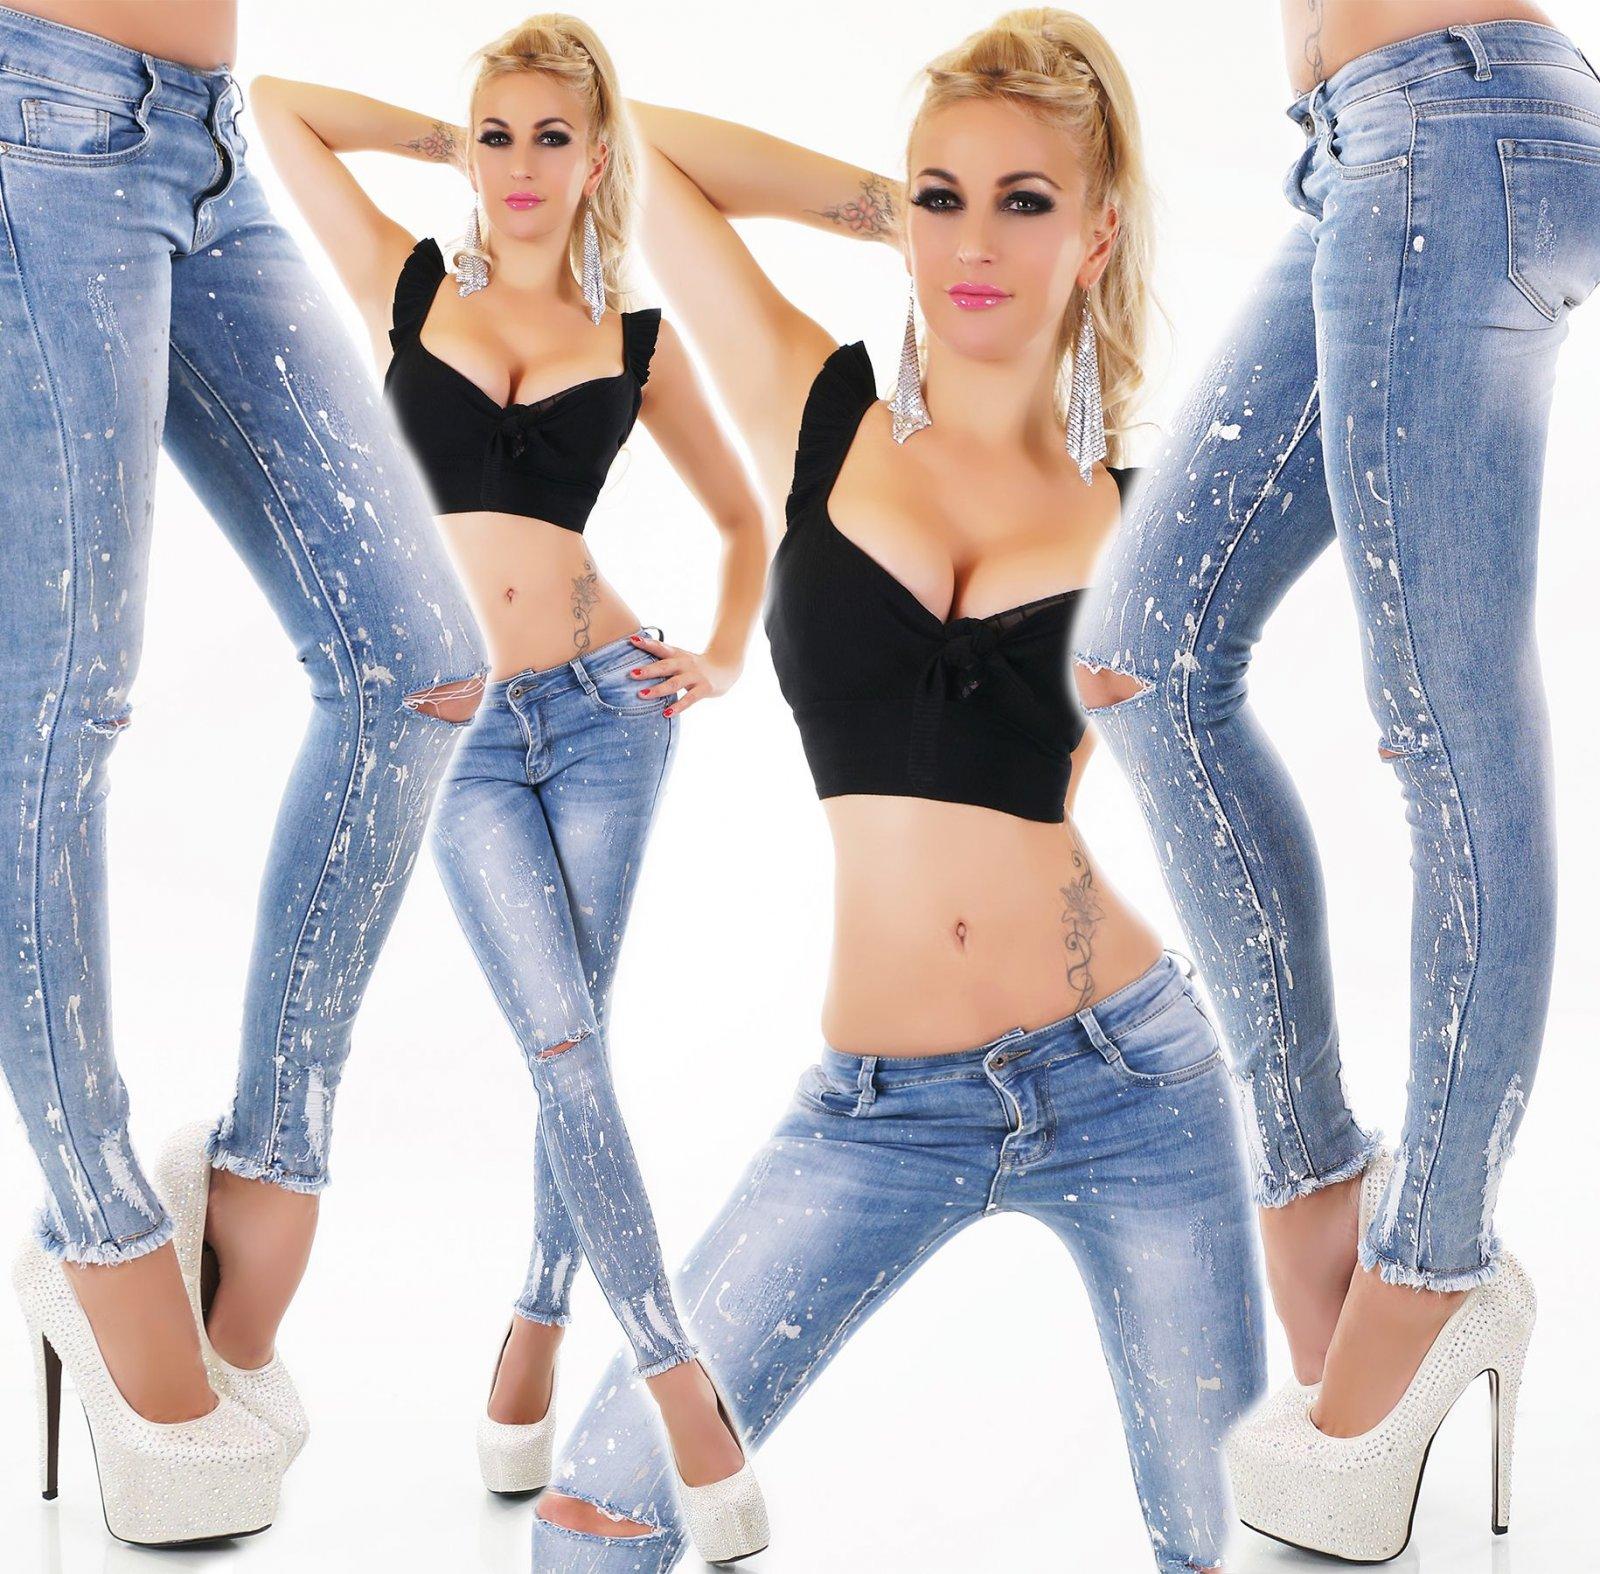 Damen Jeans Hose mit Rissen Hüft Stretch Skinny Slim Fit Röhre Röhrenjeans Blau